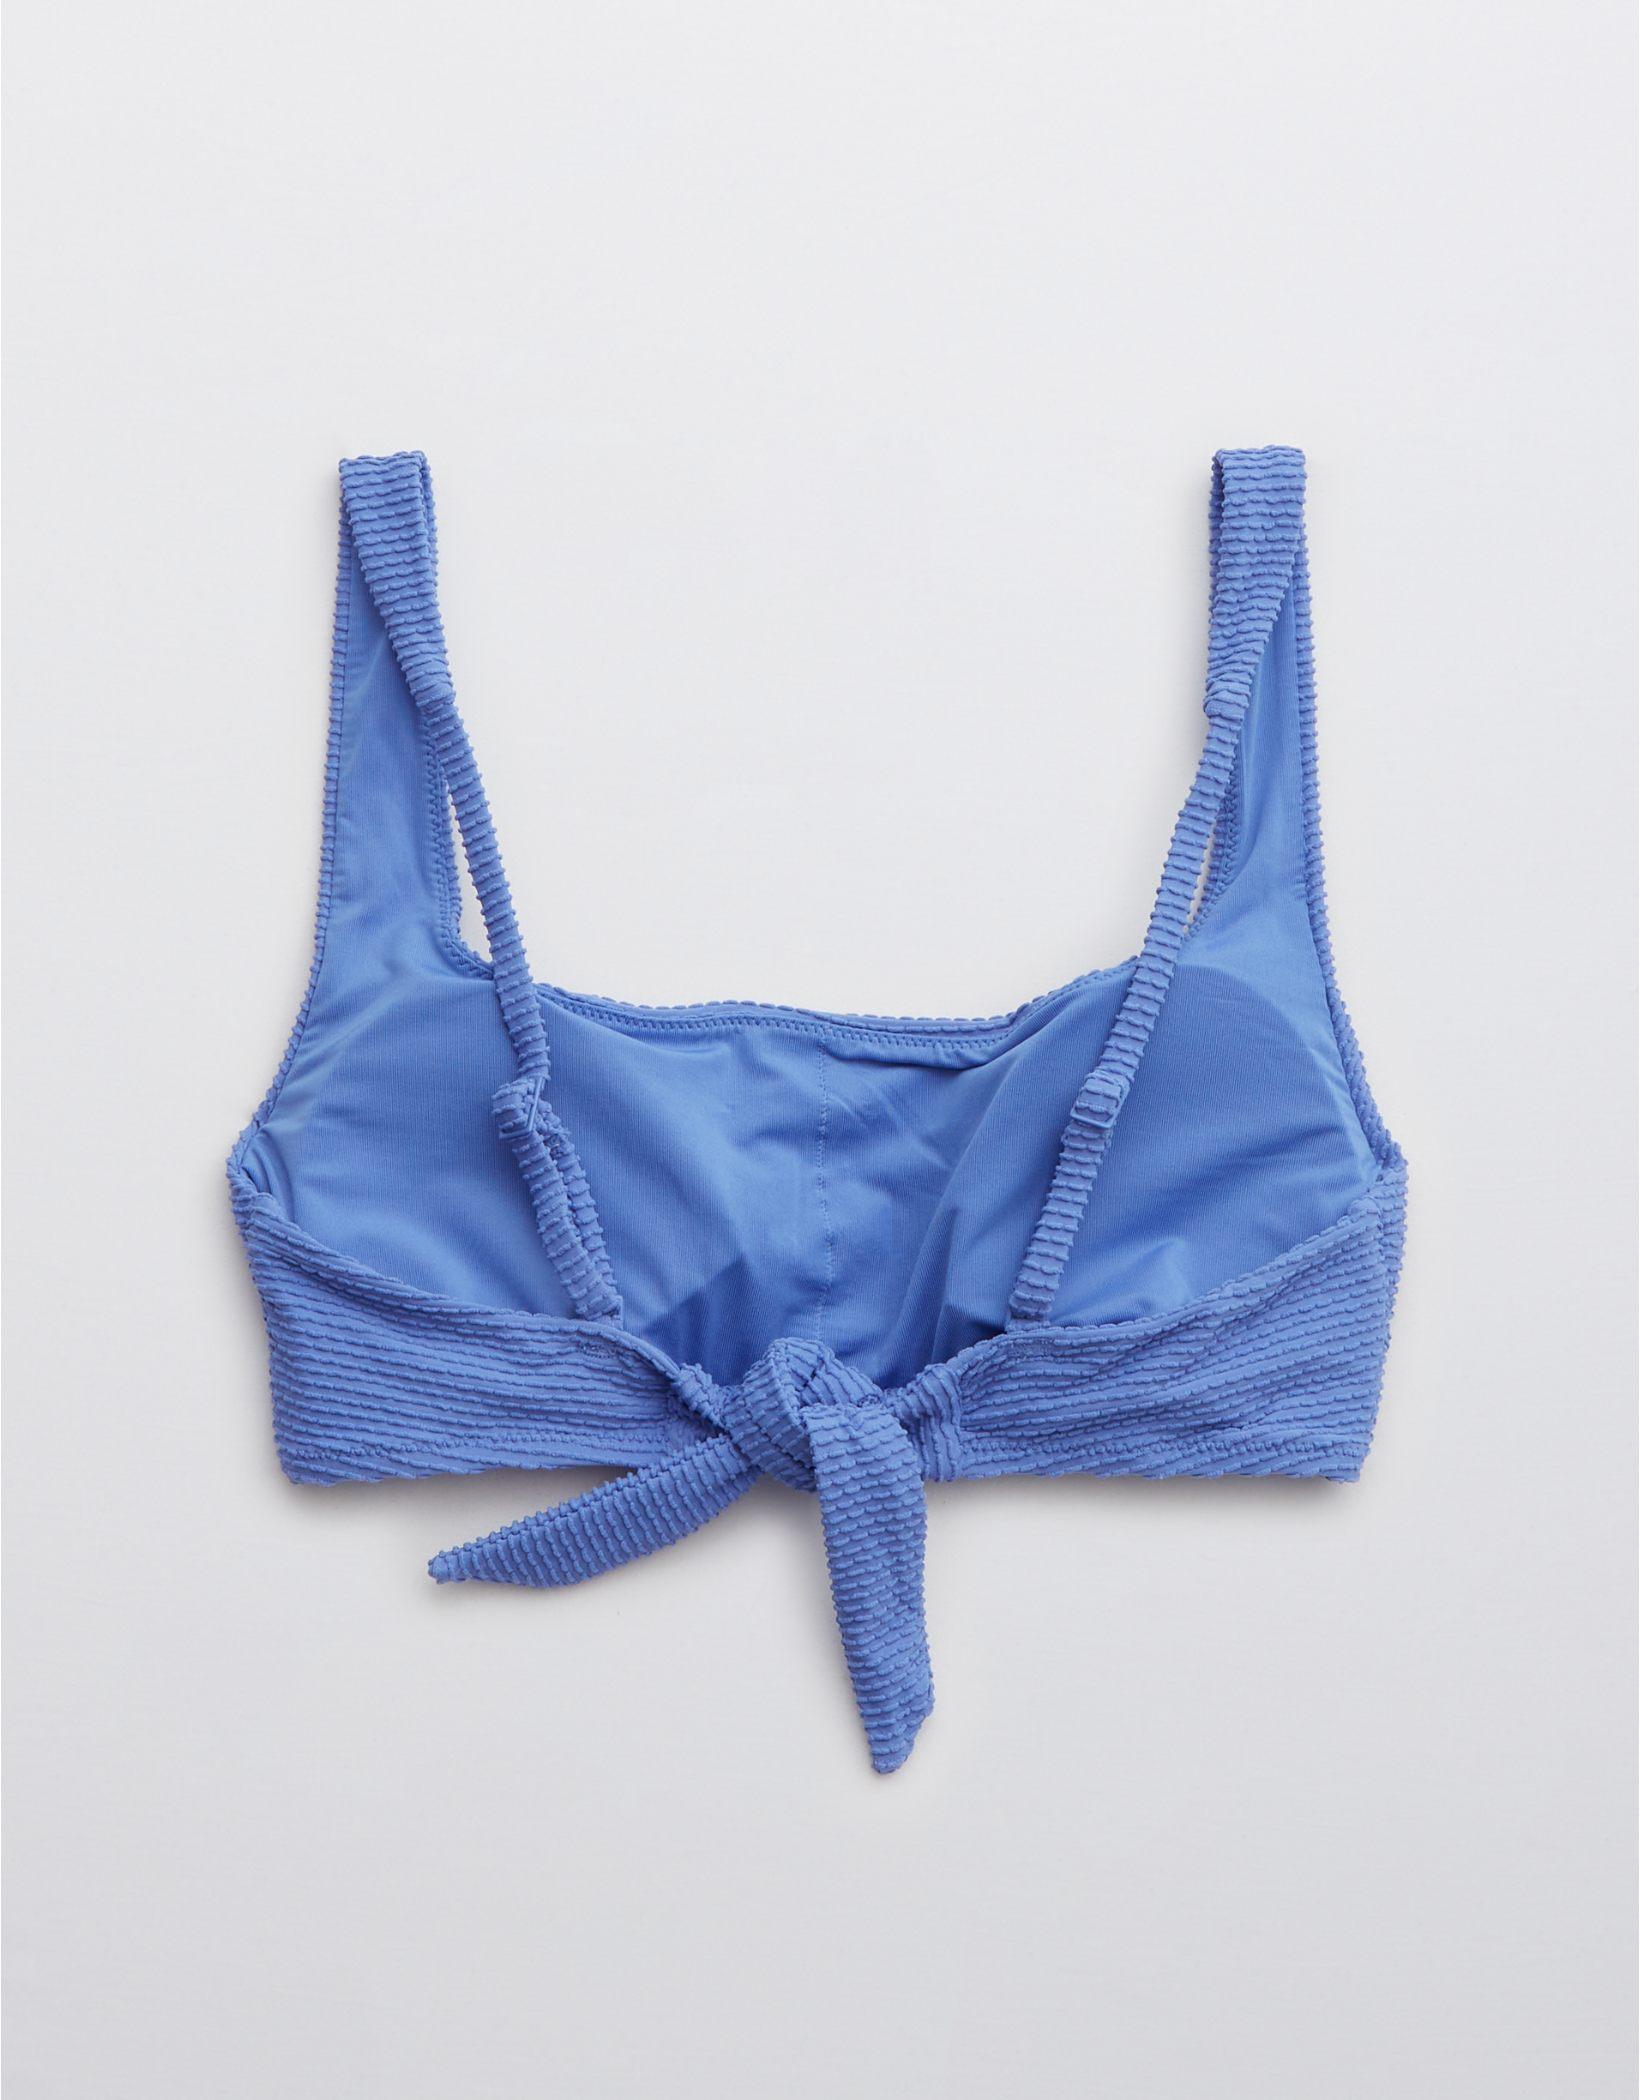 Aerie Textured Tie Back Scoop Bikini Top